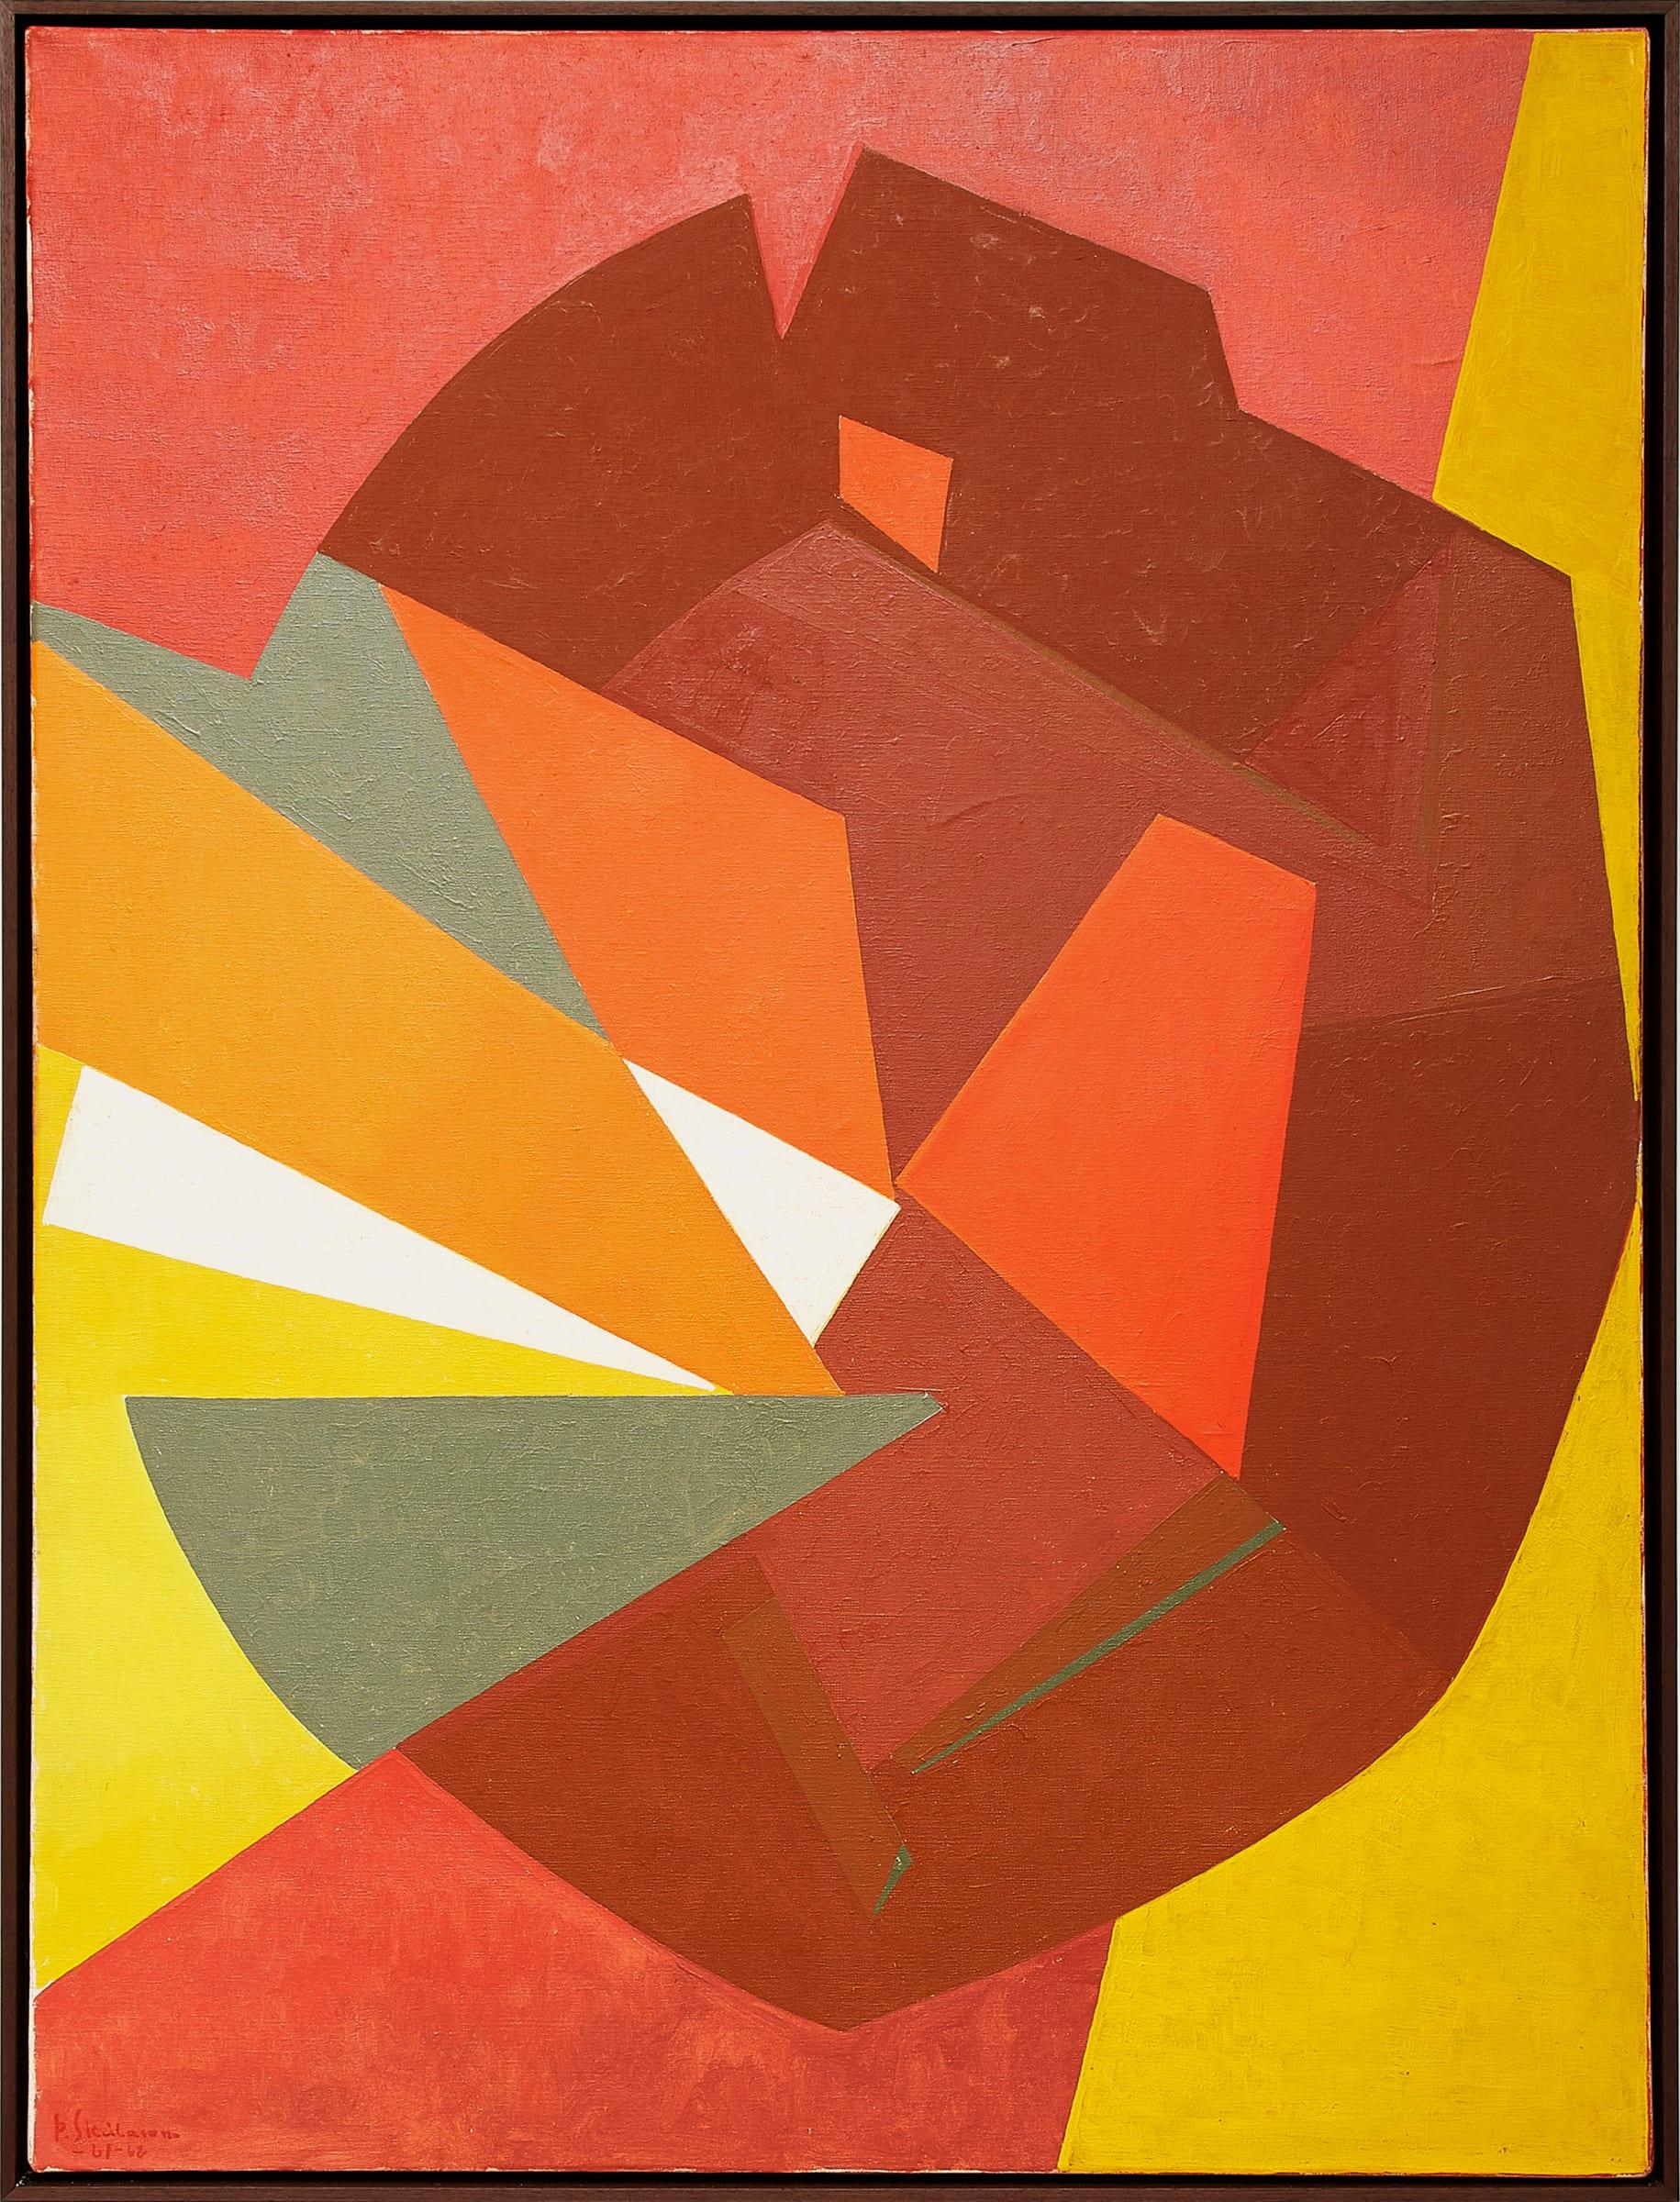 "<span class=""link fancybox-details-link""><a href=""/exhibitions/163/works/artworks14969/"">View Detail Page</a></span><div class=""artist""><strong>Þorvaldur Skúlason</strong></div> 1906-1984<div class=""title""><em>Komposition no. 17</em>, 1961-1962</div><div class=""medium"">oil on canvas</div><div class=""dimensions"">Framed: 134 x 101<br>131 x 97 cm</div>"